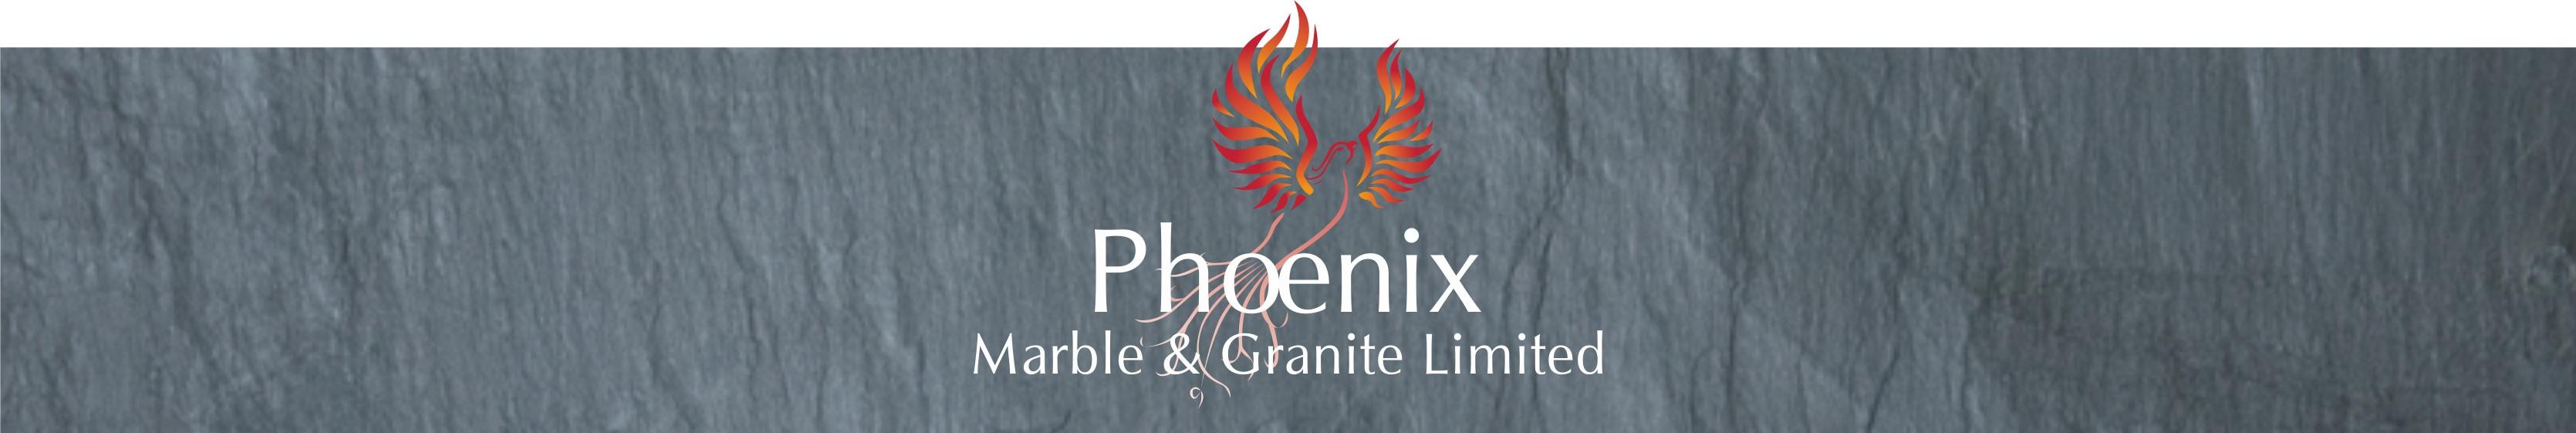 Phoenix Marble & Granite logo